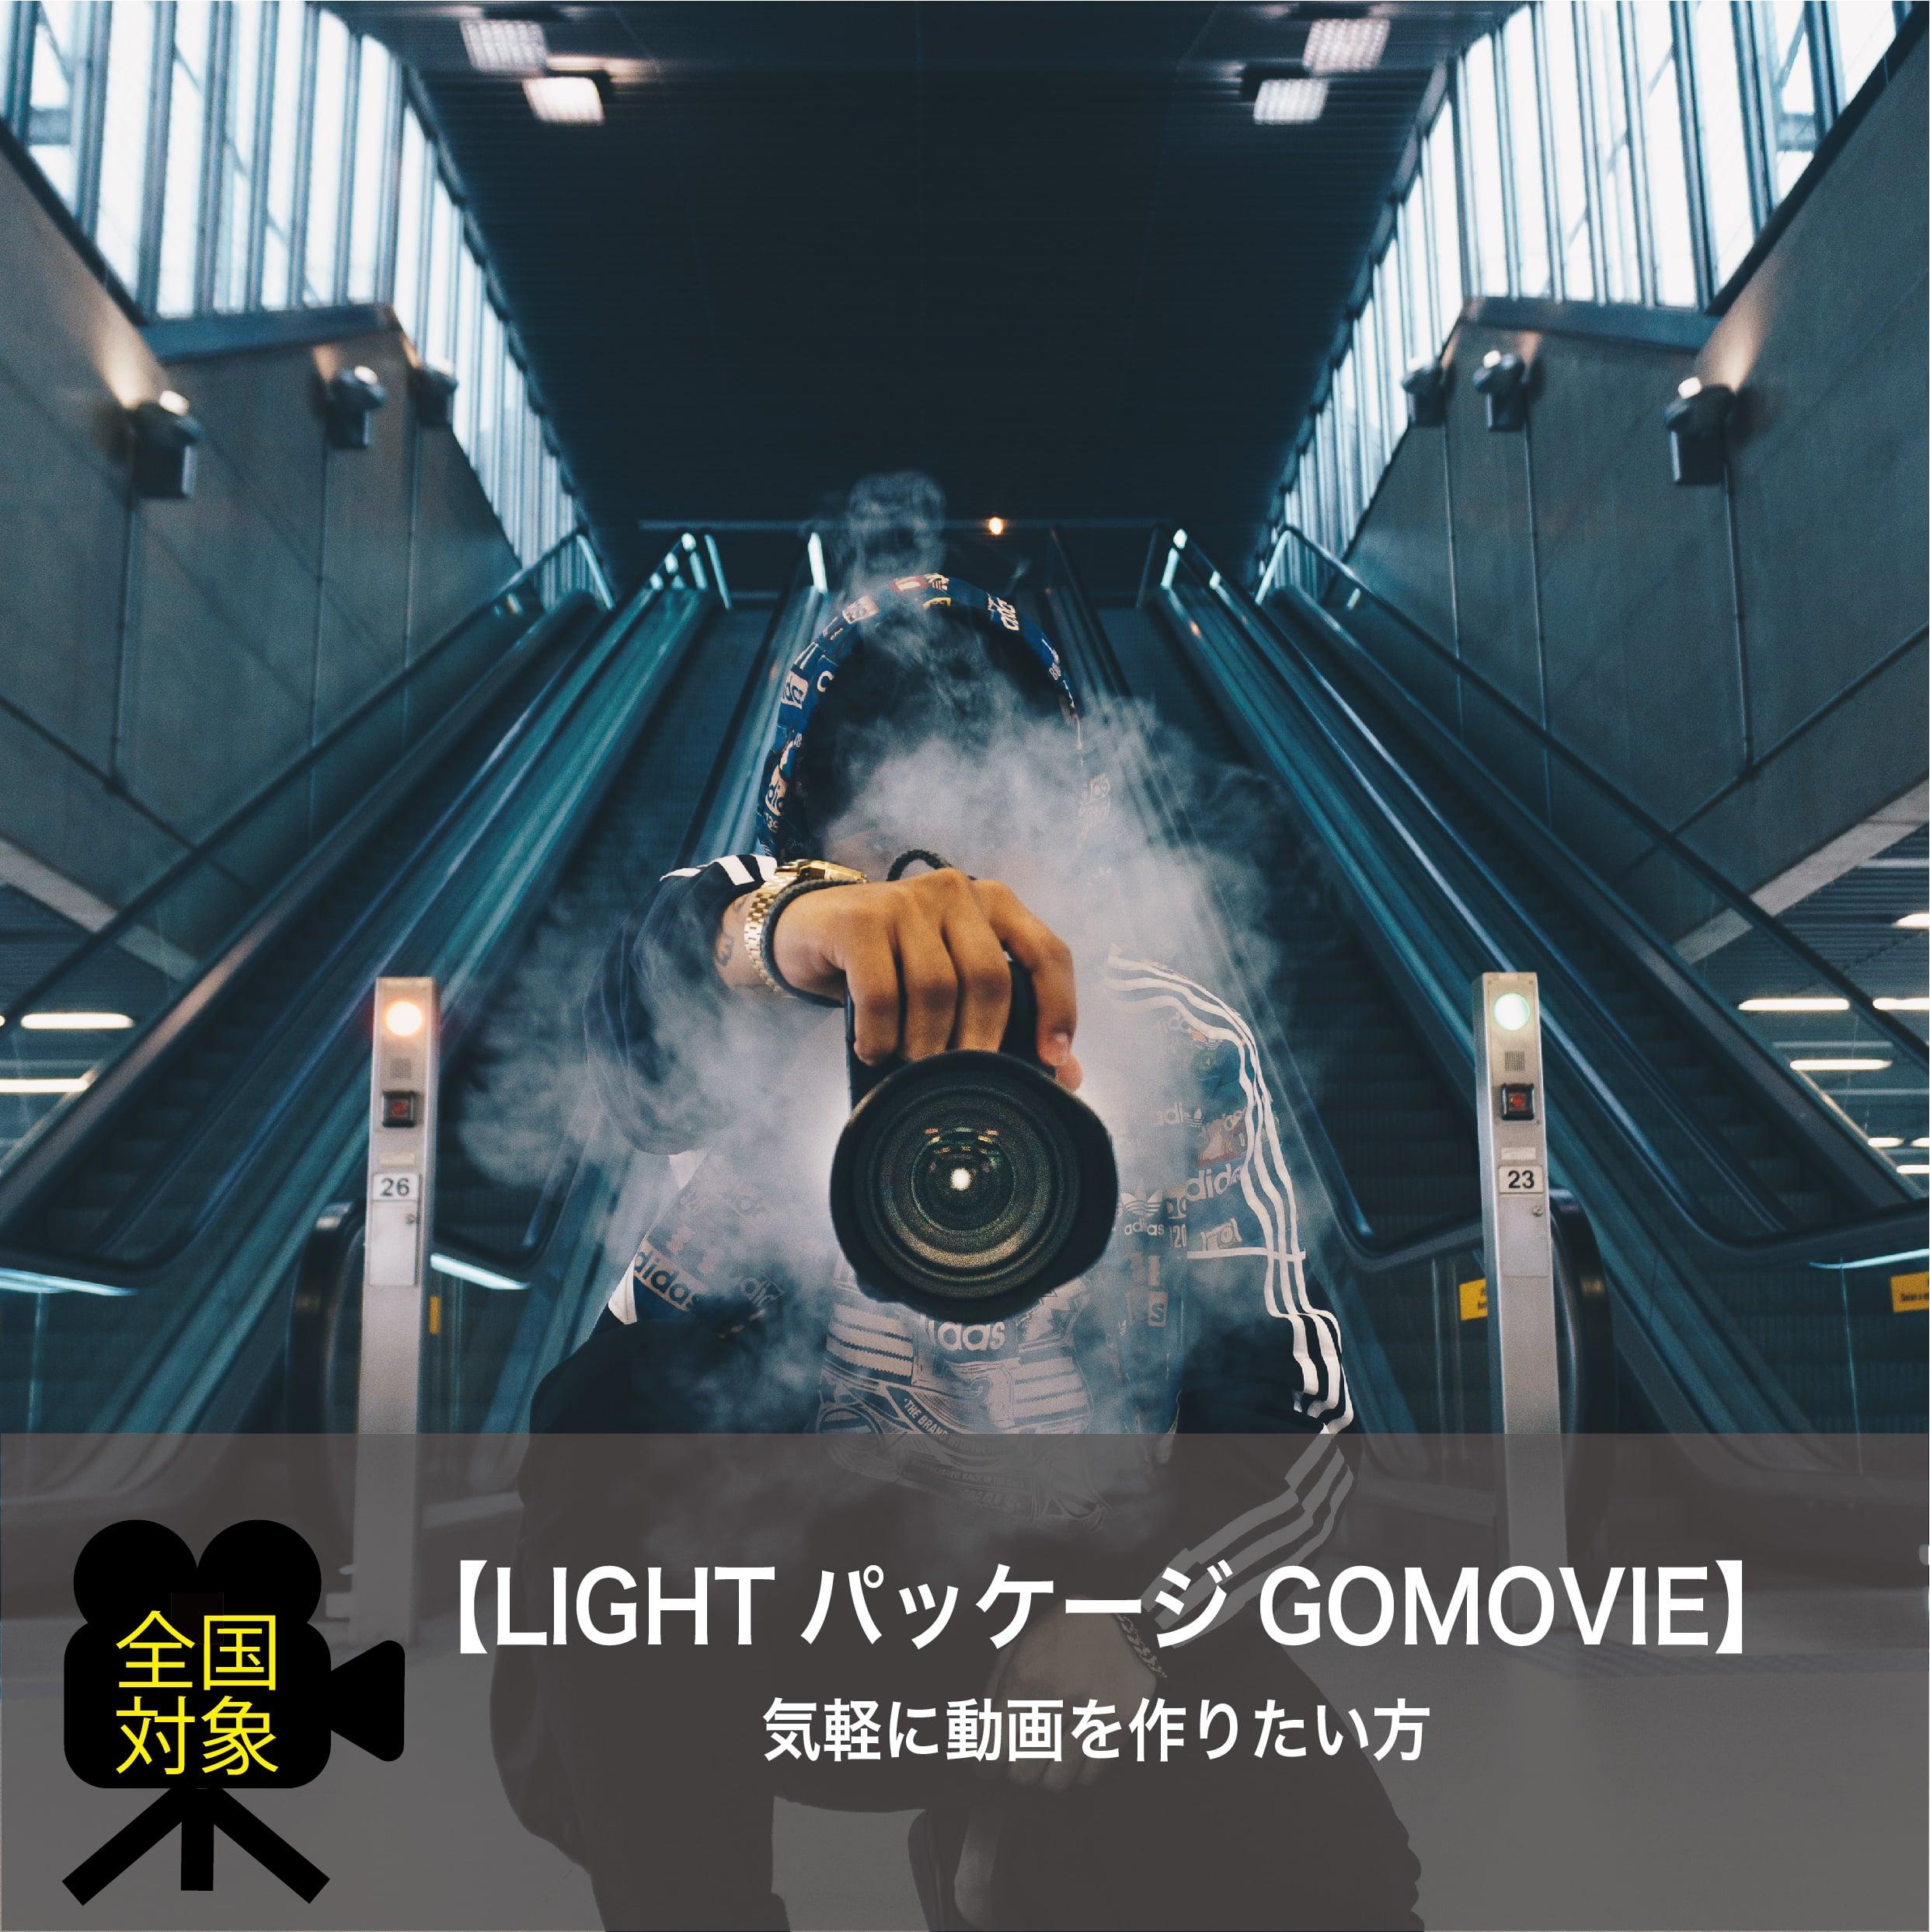 【LIGHTパッケージGOMOVIE】気軽に動画を作りたい方のイメージその1